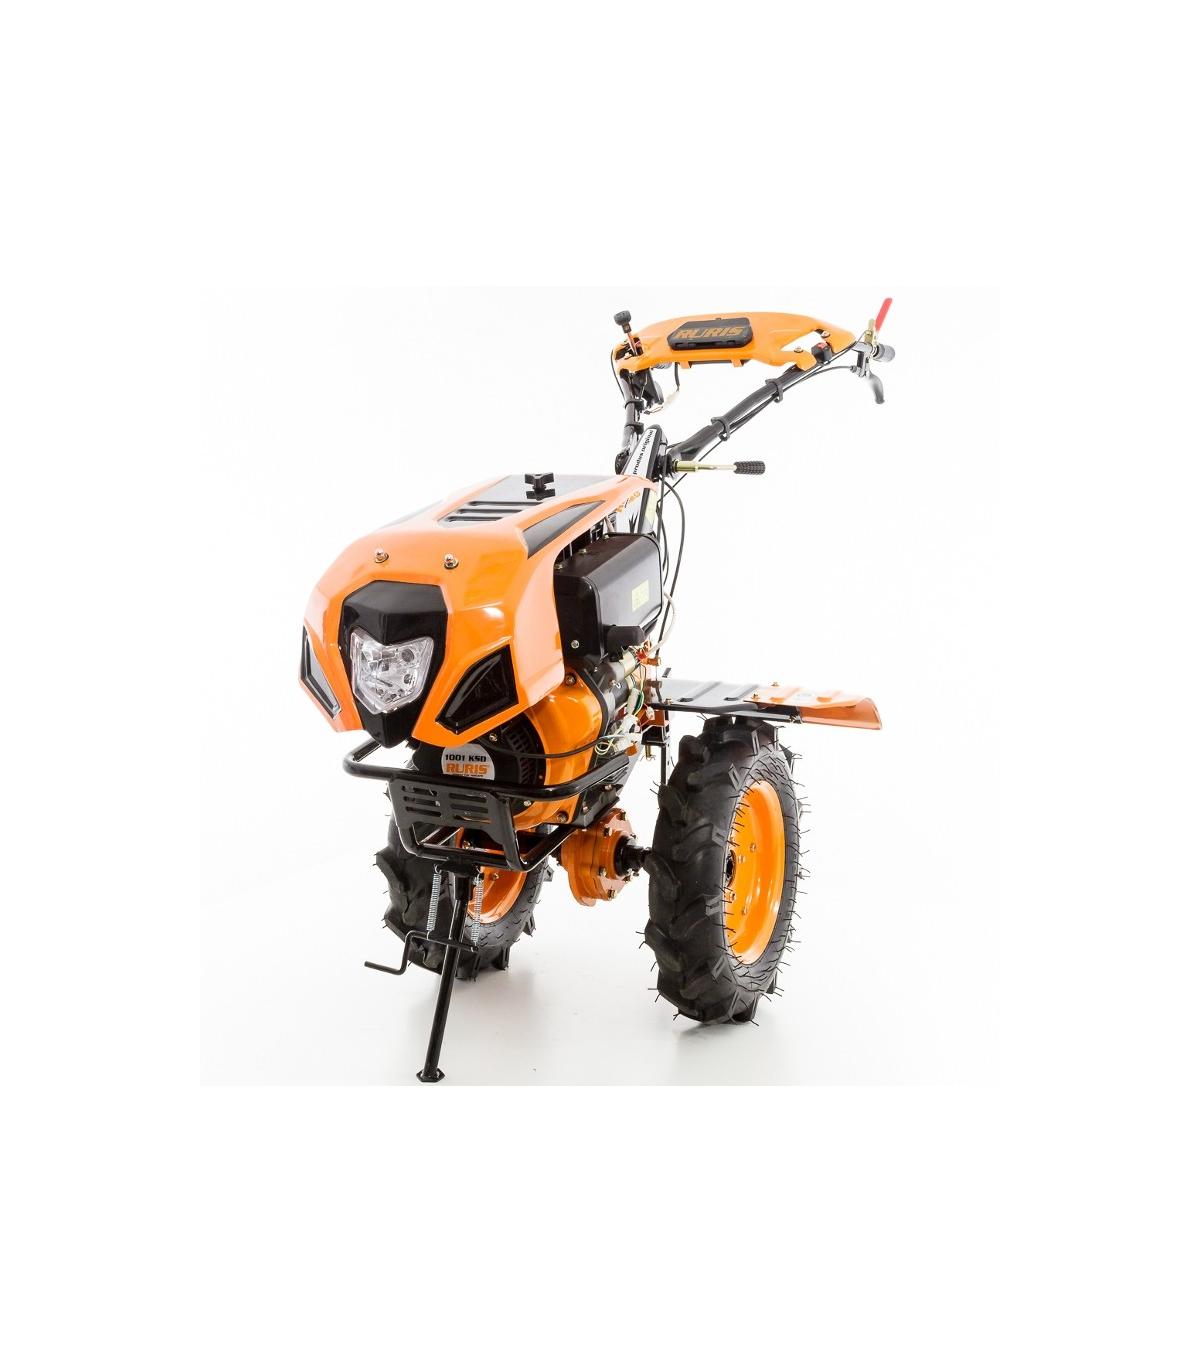 Motoculteur Professionnel Motoculteur Motoculteur Kubota Motoculteur Goldoni